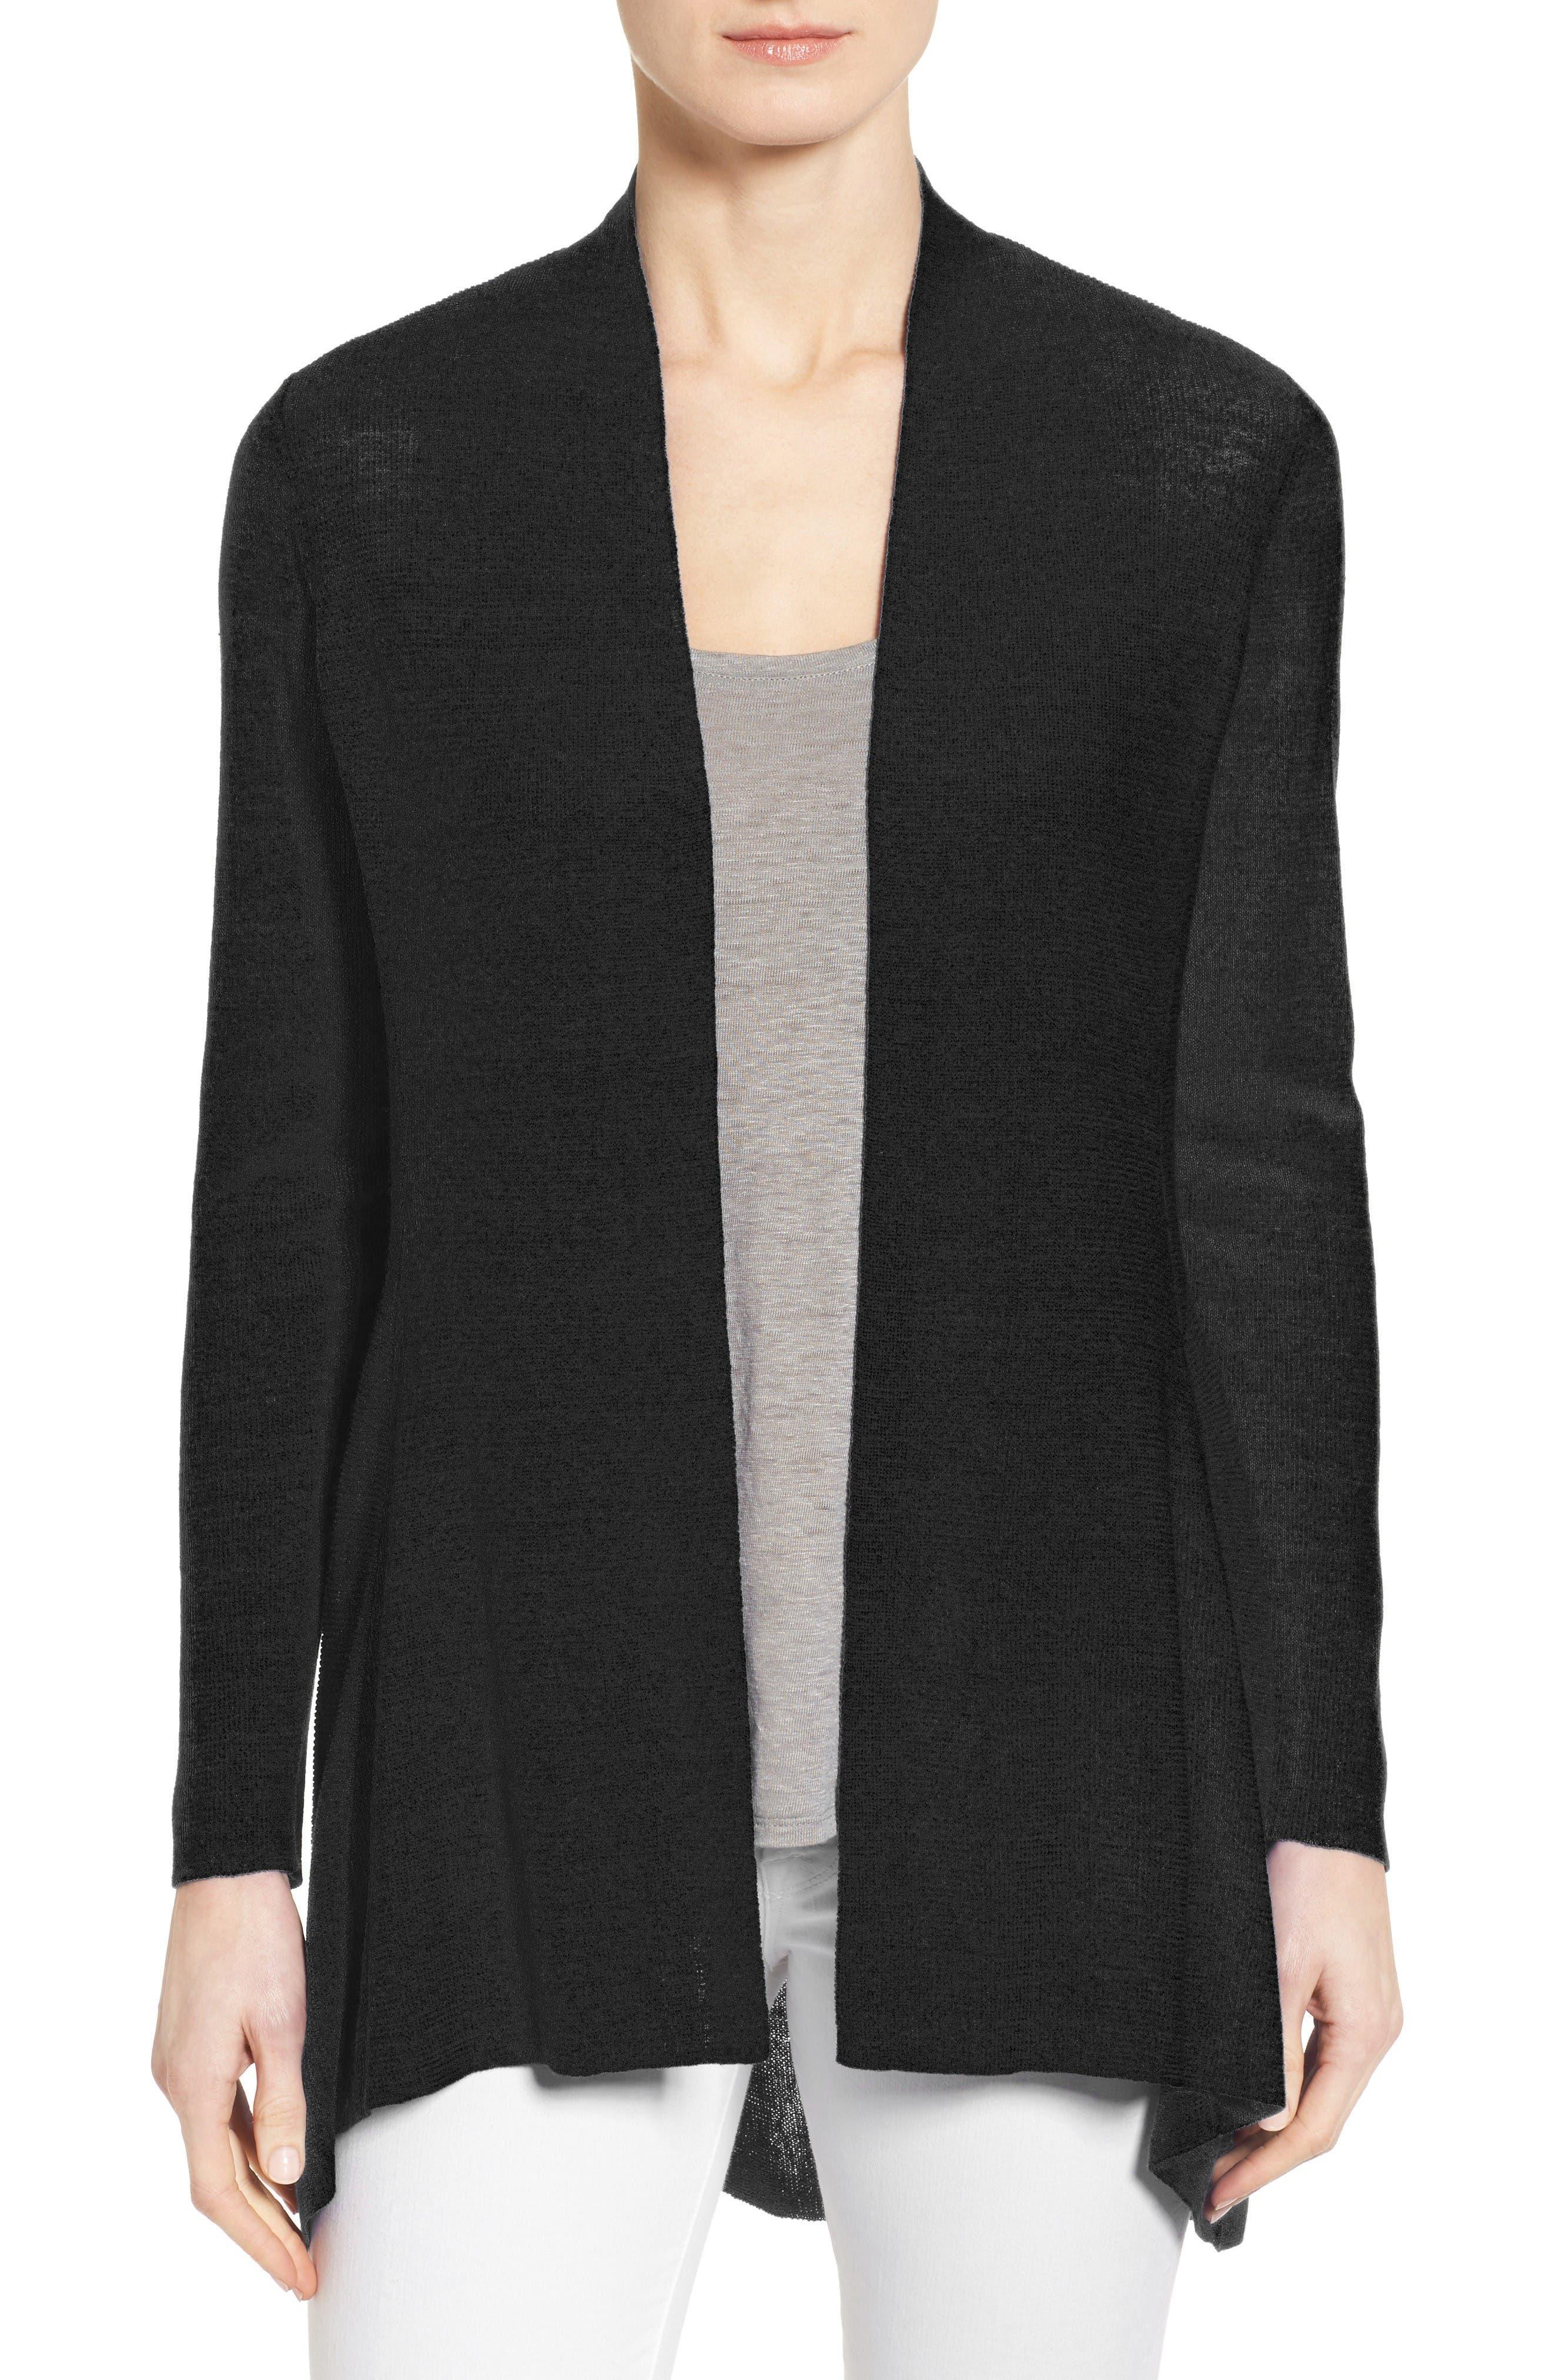 Alternate Image 1 Selected - Eileen Fisher Shaped Organic Linen Blend Cardigan (Regular & Petite)